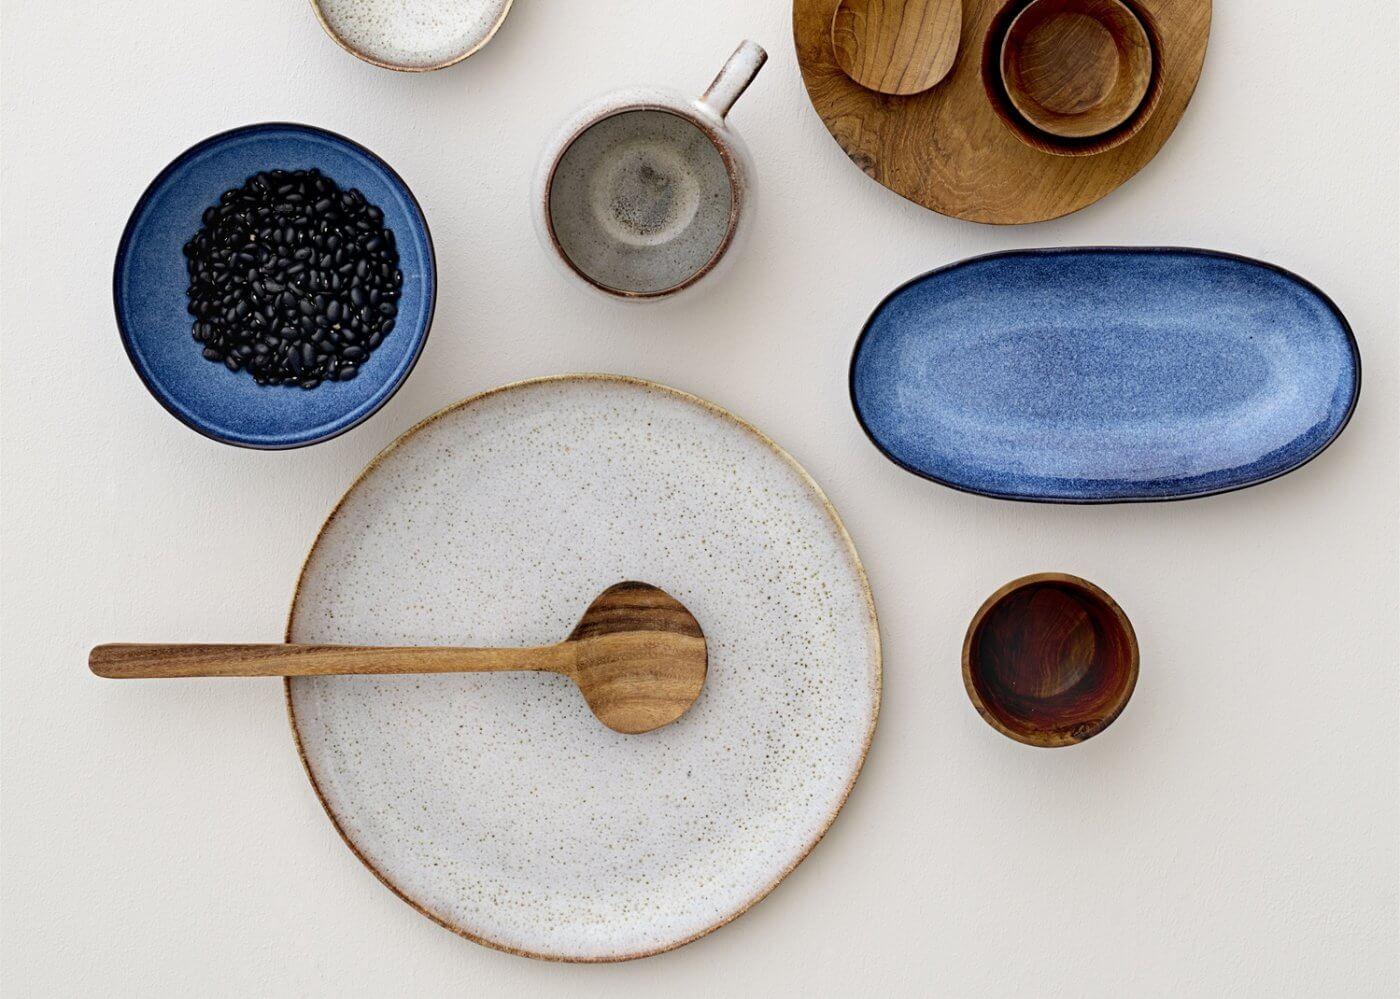 Ceramics | The Mustcard